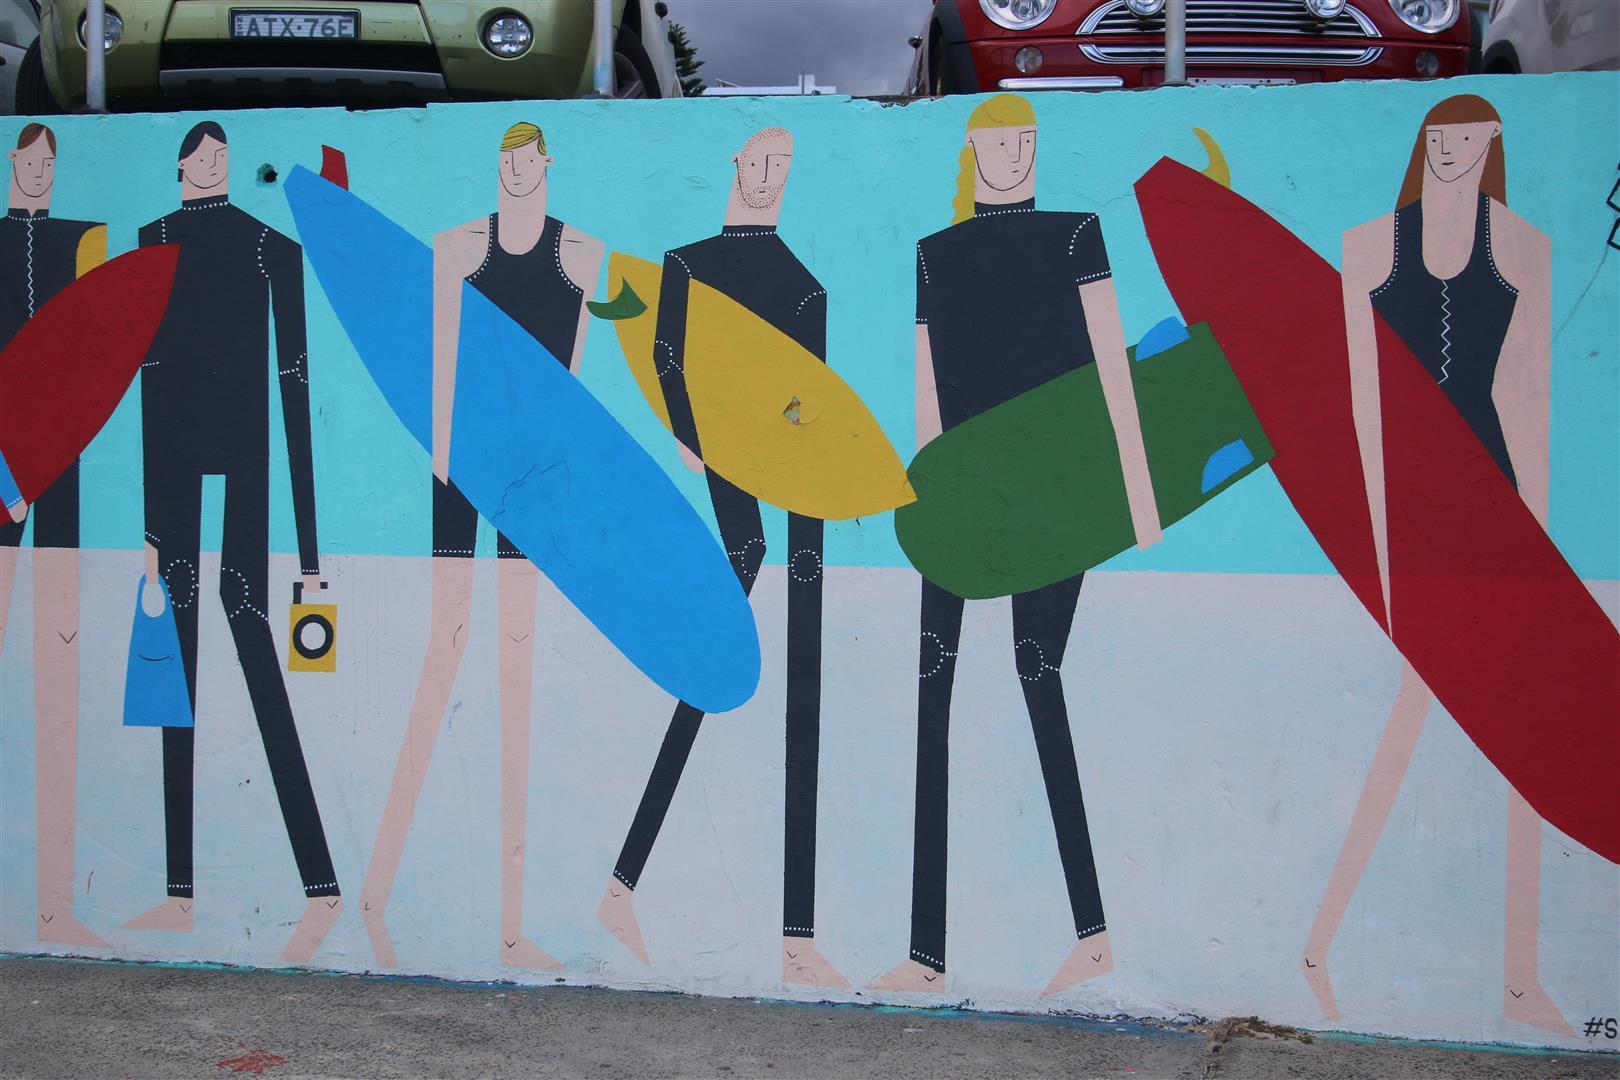 Spiagge (e squali) in Australia, il paese a testa in giù